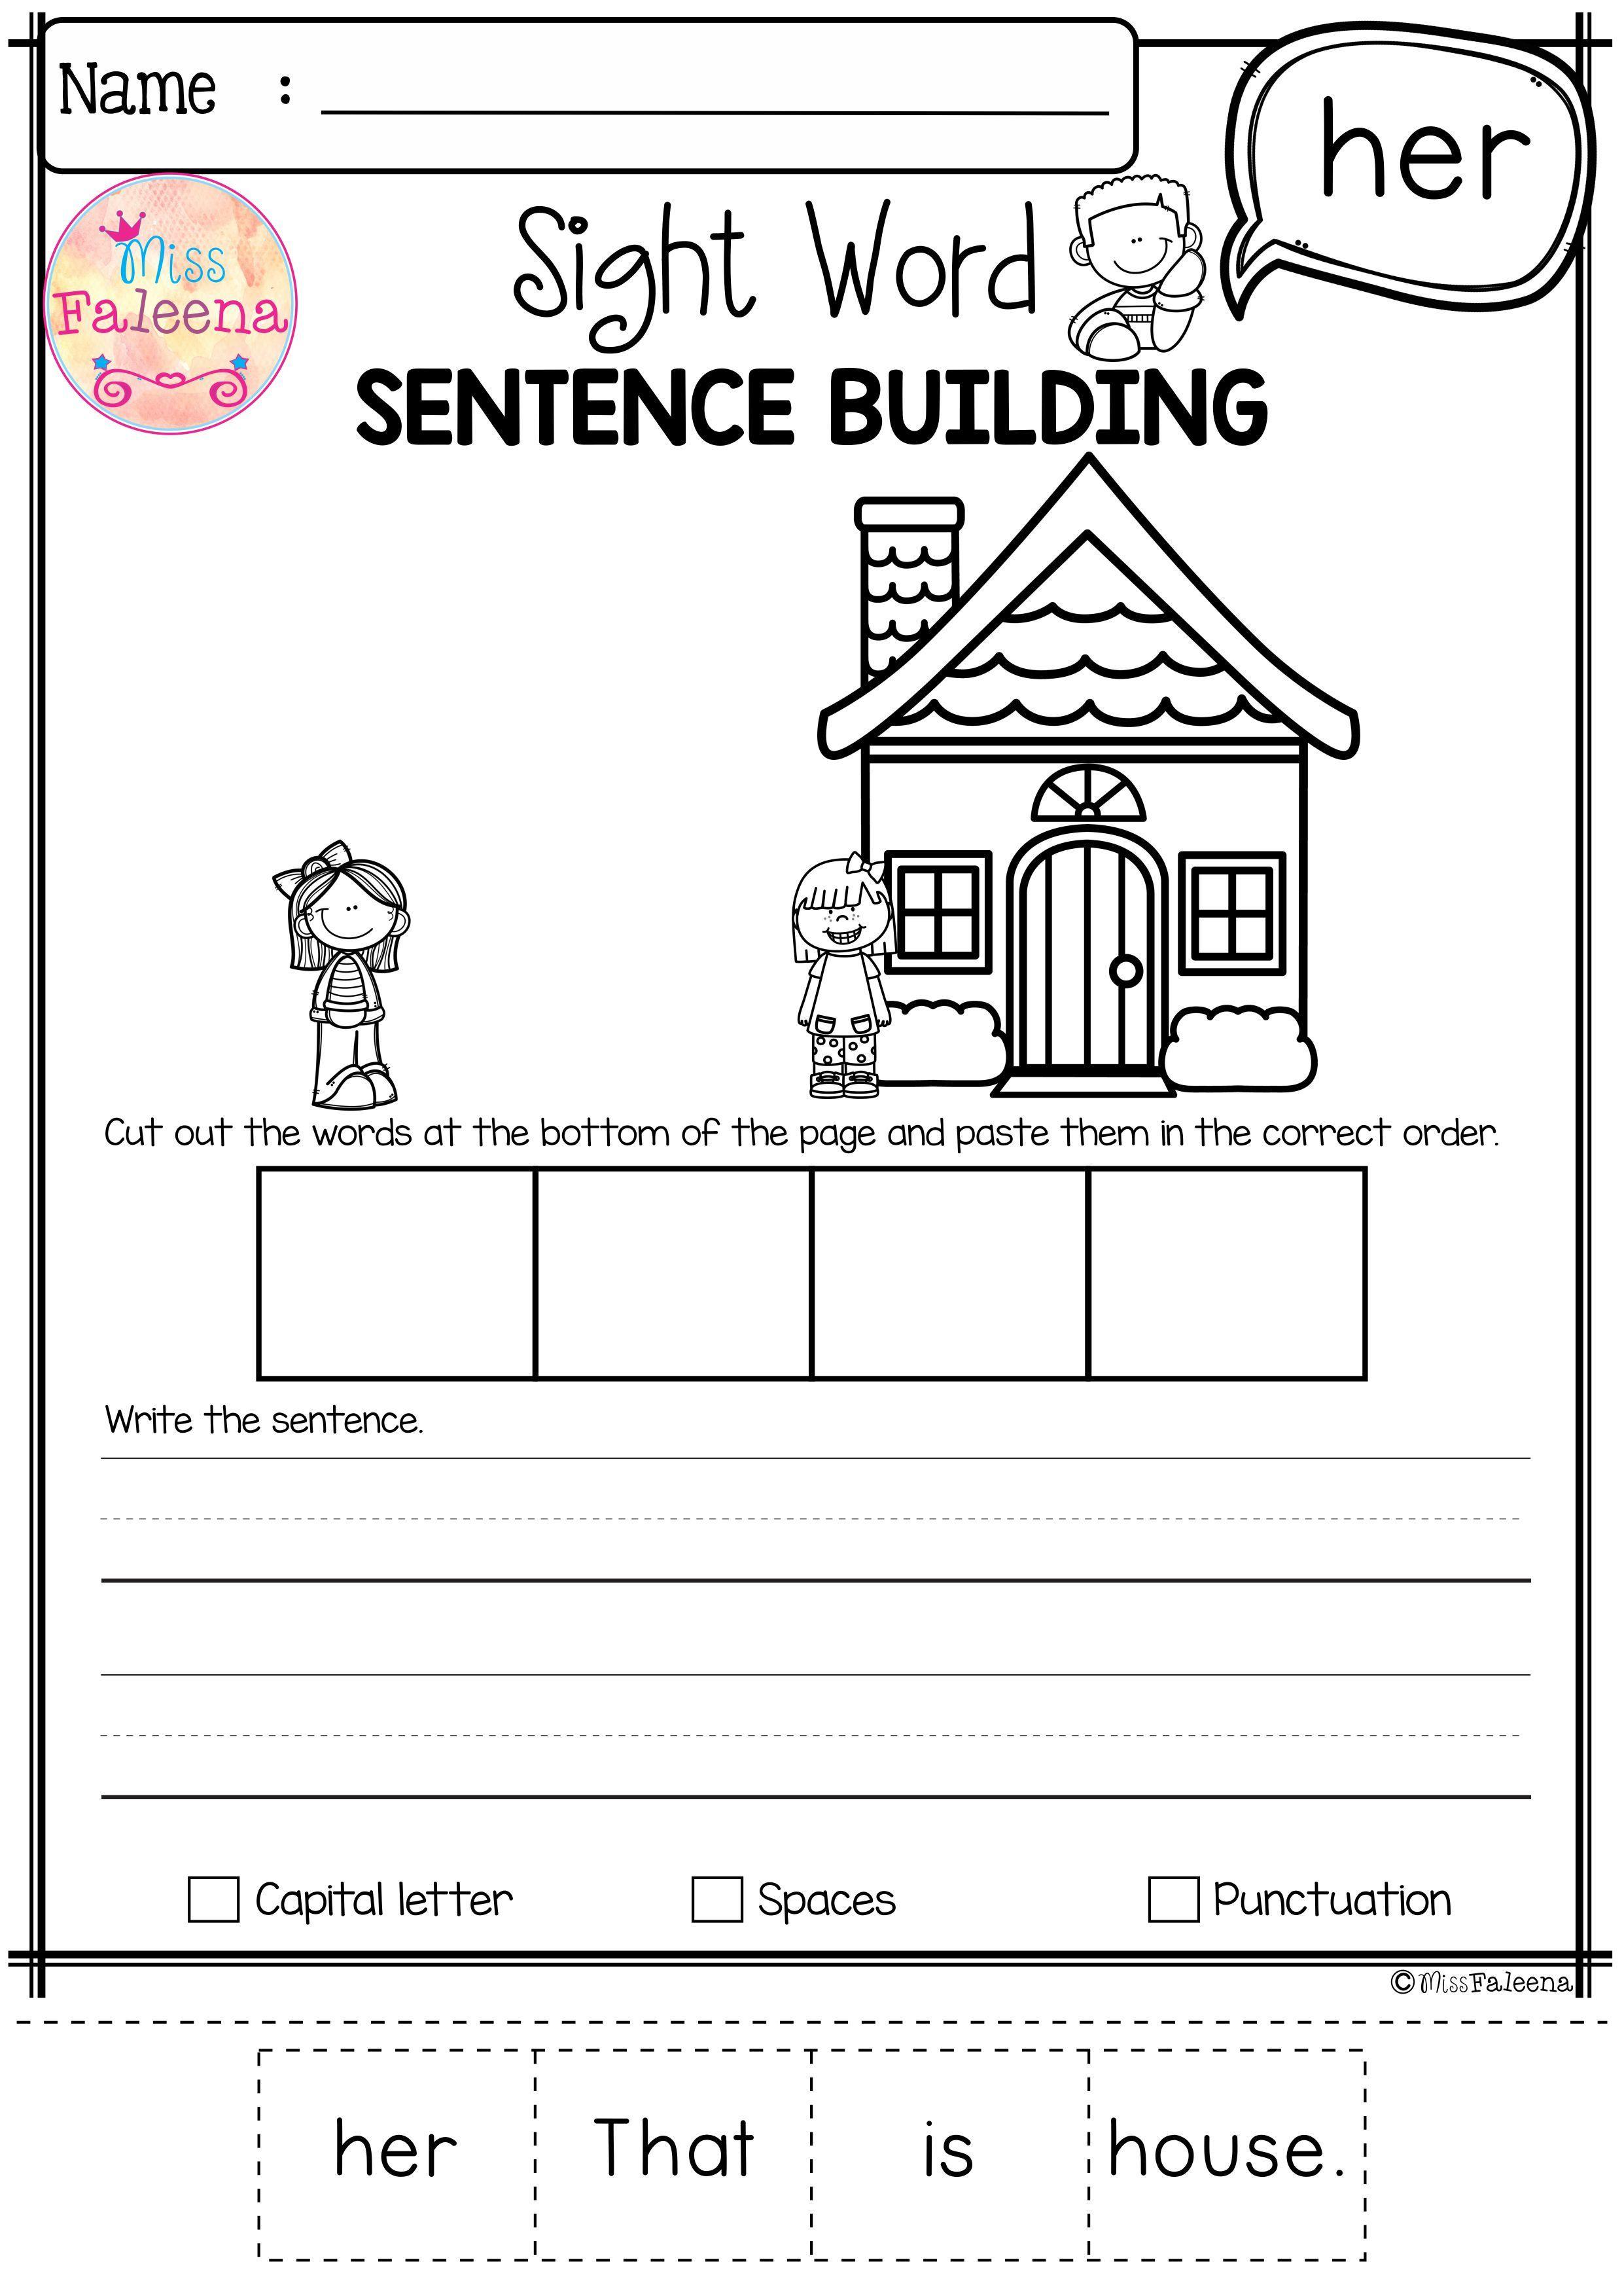 Free Sight Word Sentence Building Sentence Building Sight Word Sentences Sight Words [ 3508 x 2482 Pixel ]